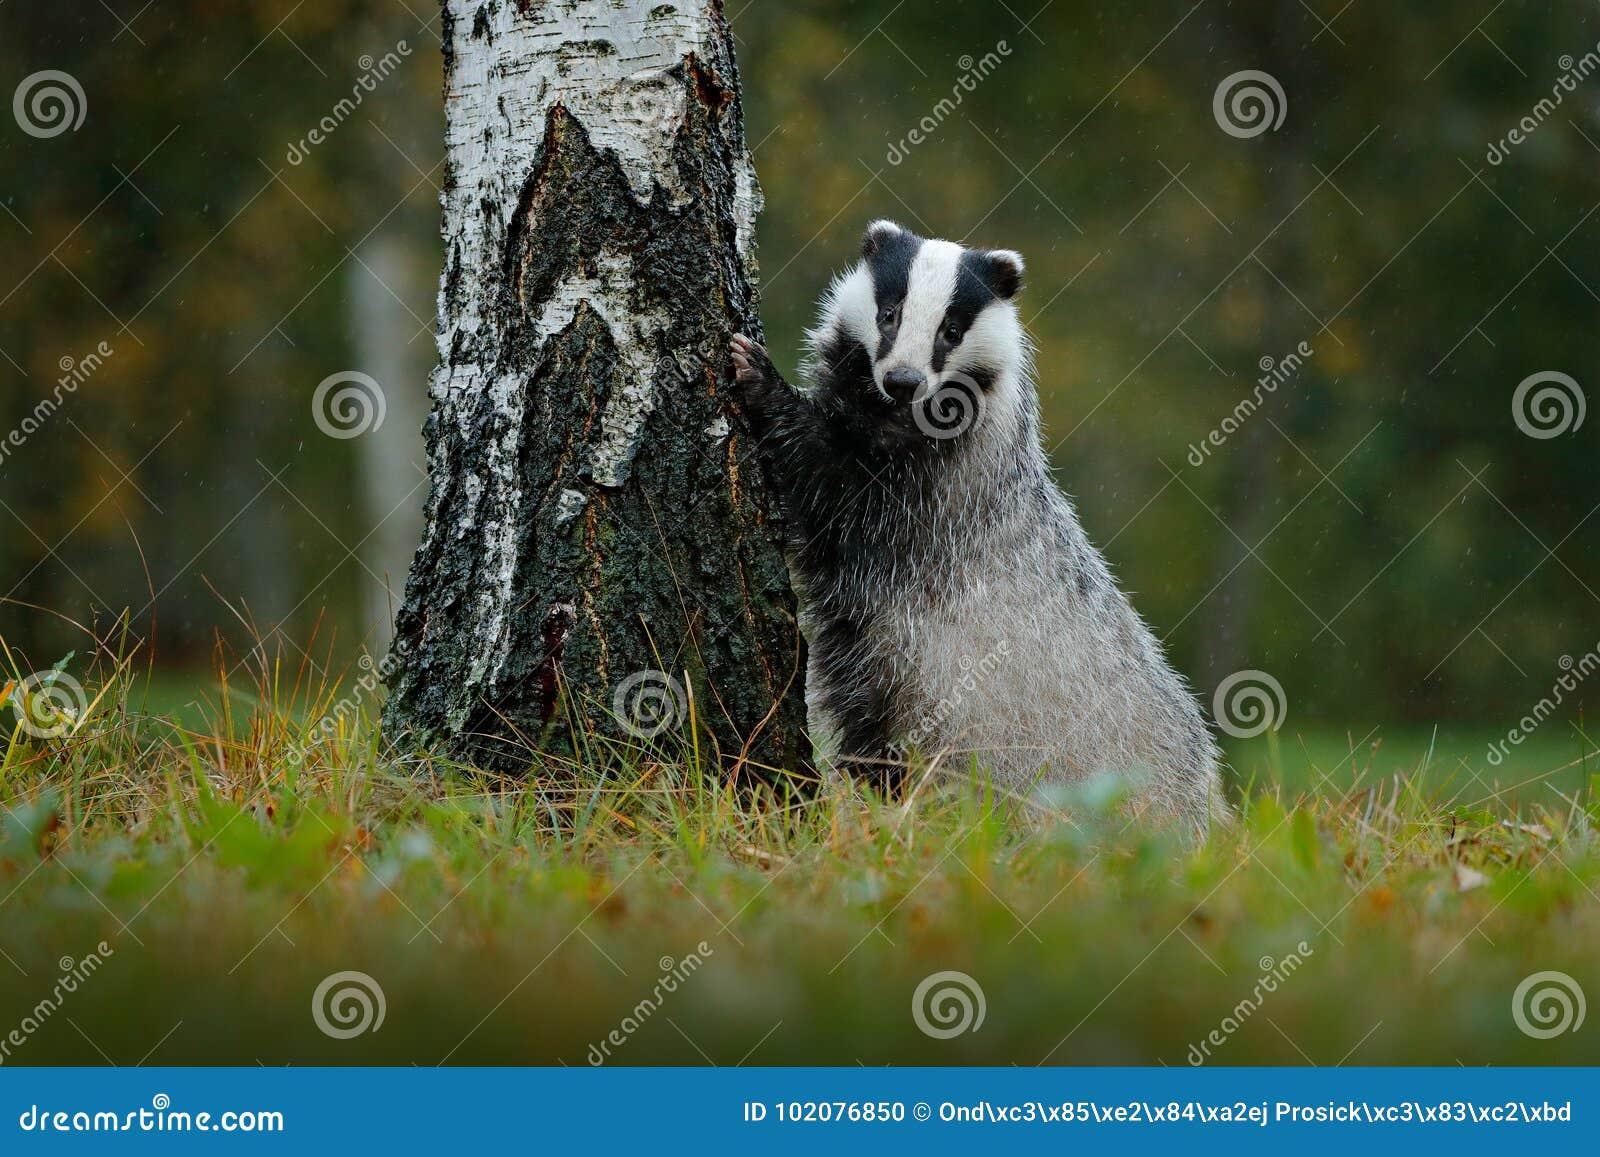 E Szene der wild lebenden Tiere Wilder Dachs, Meles Meles, Tier im Holz r